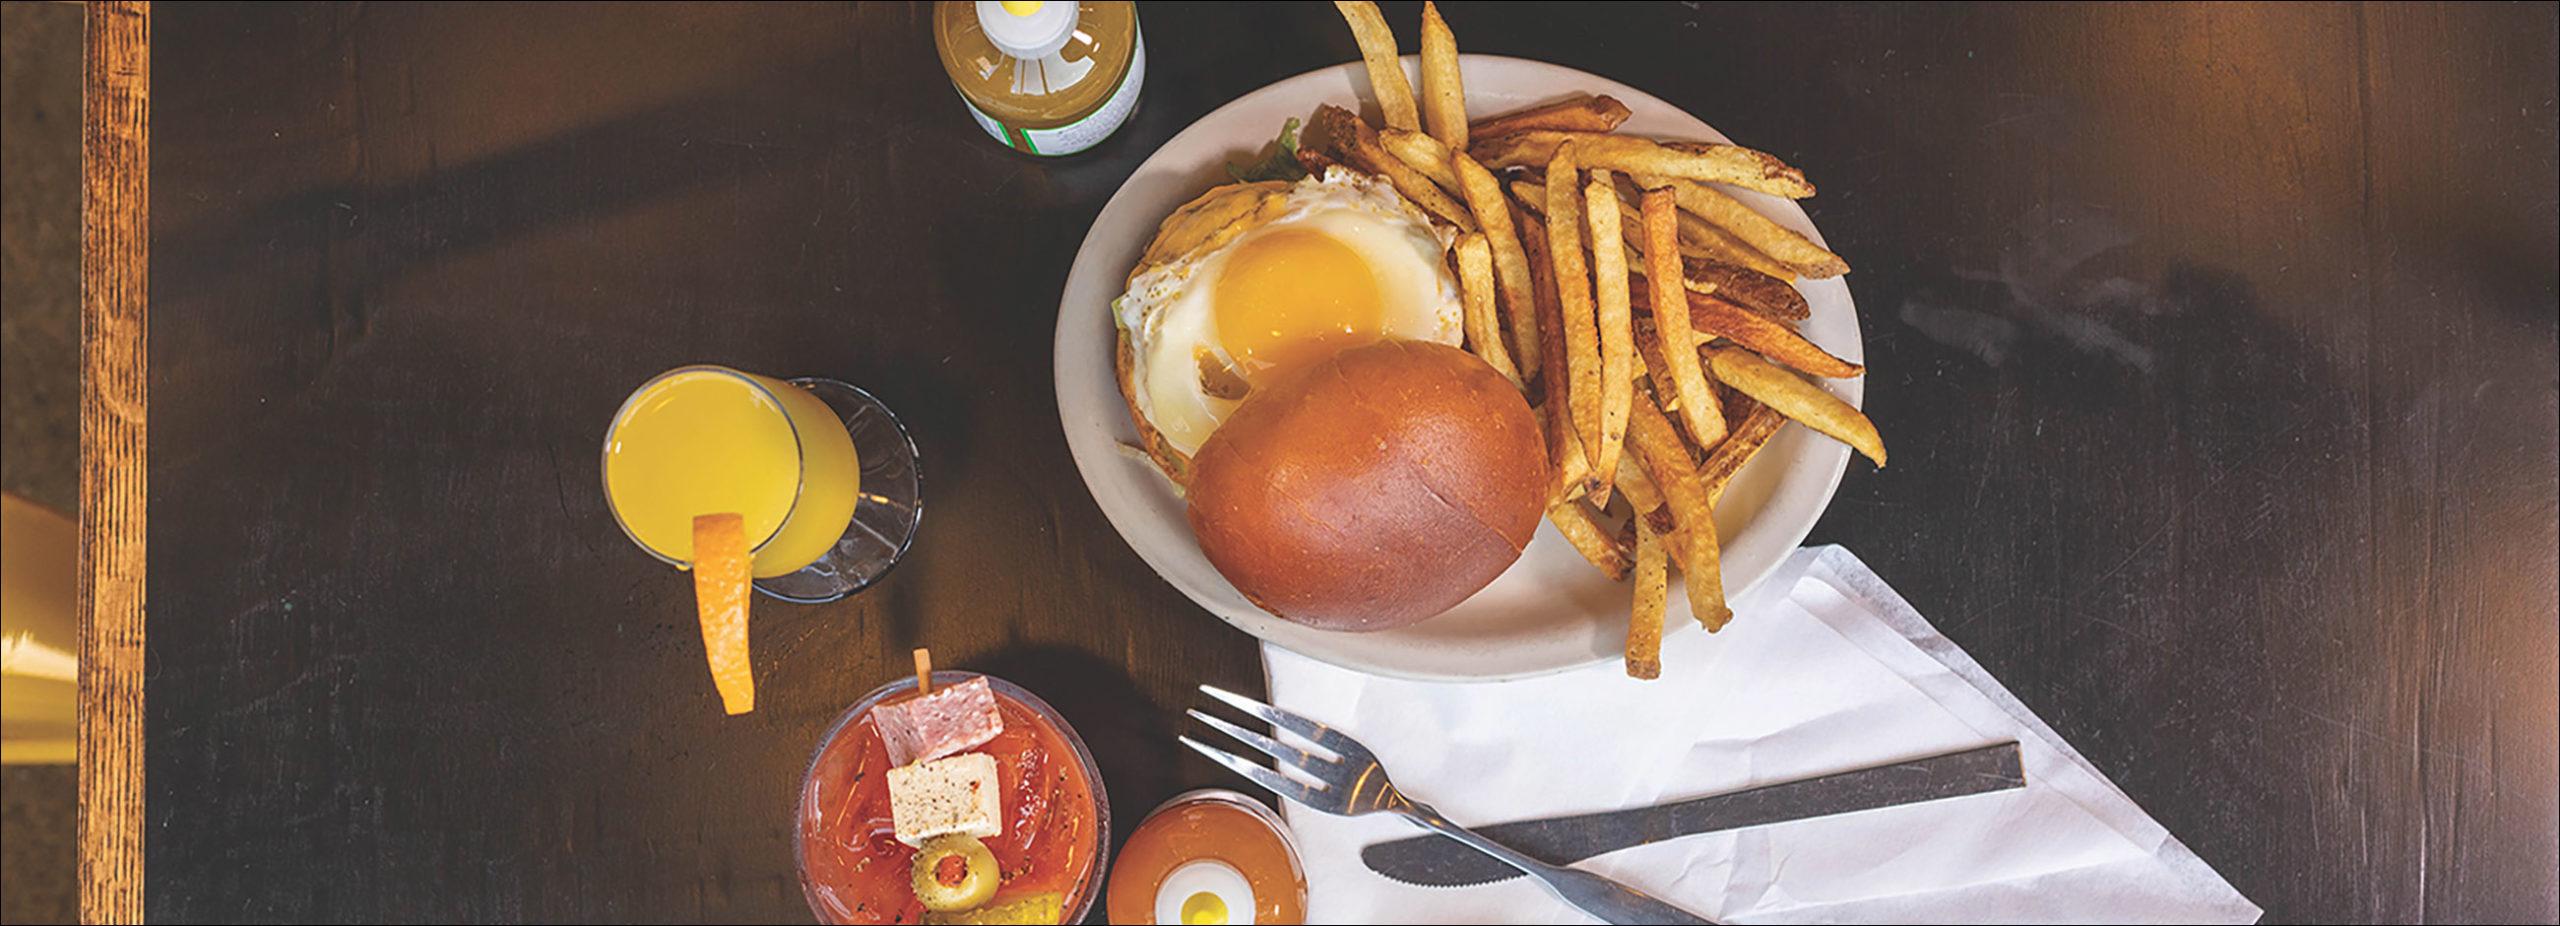 9 Budget-Friendly Detroit Restaurants for Foodies